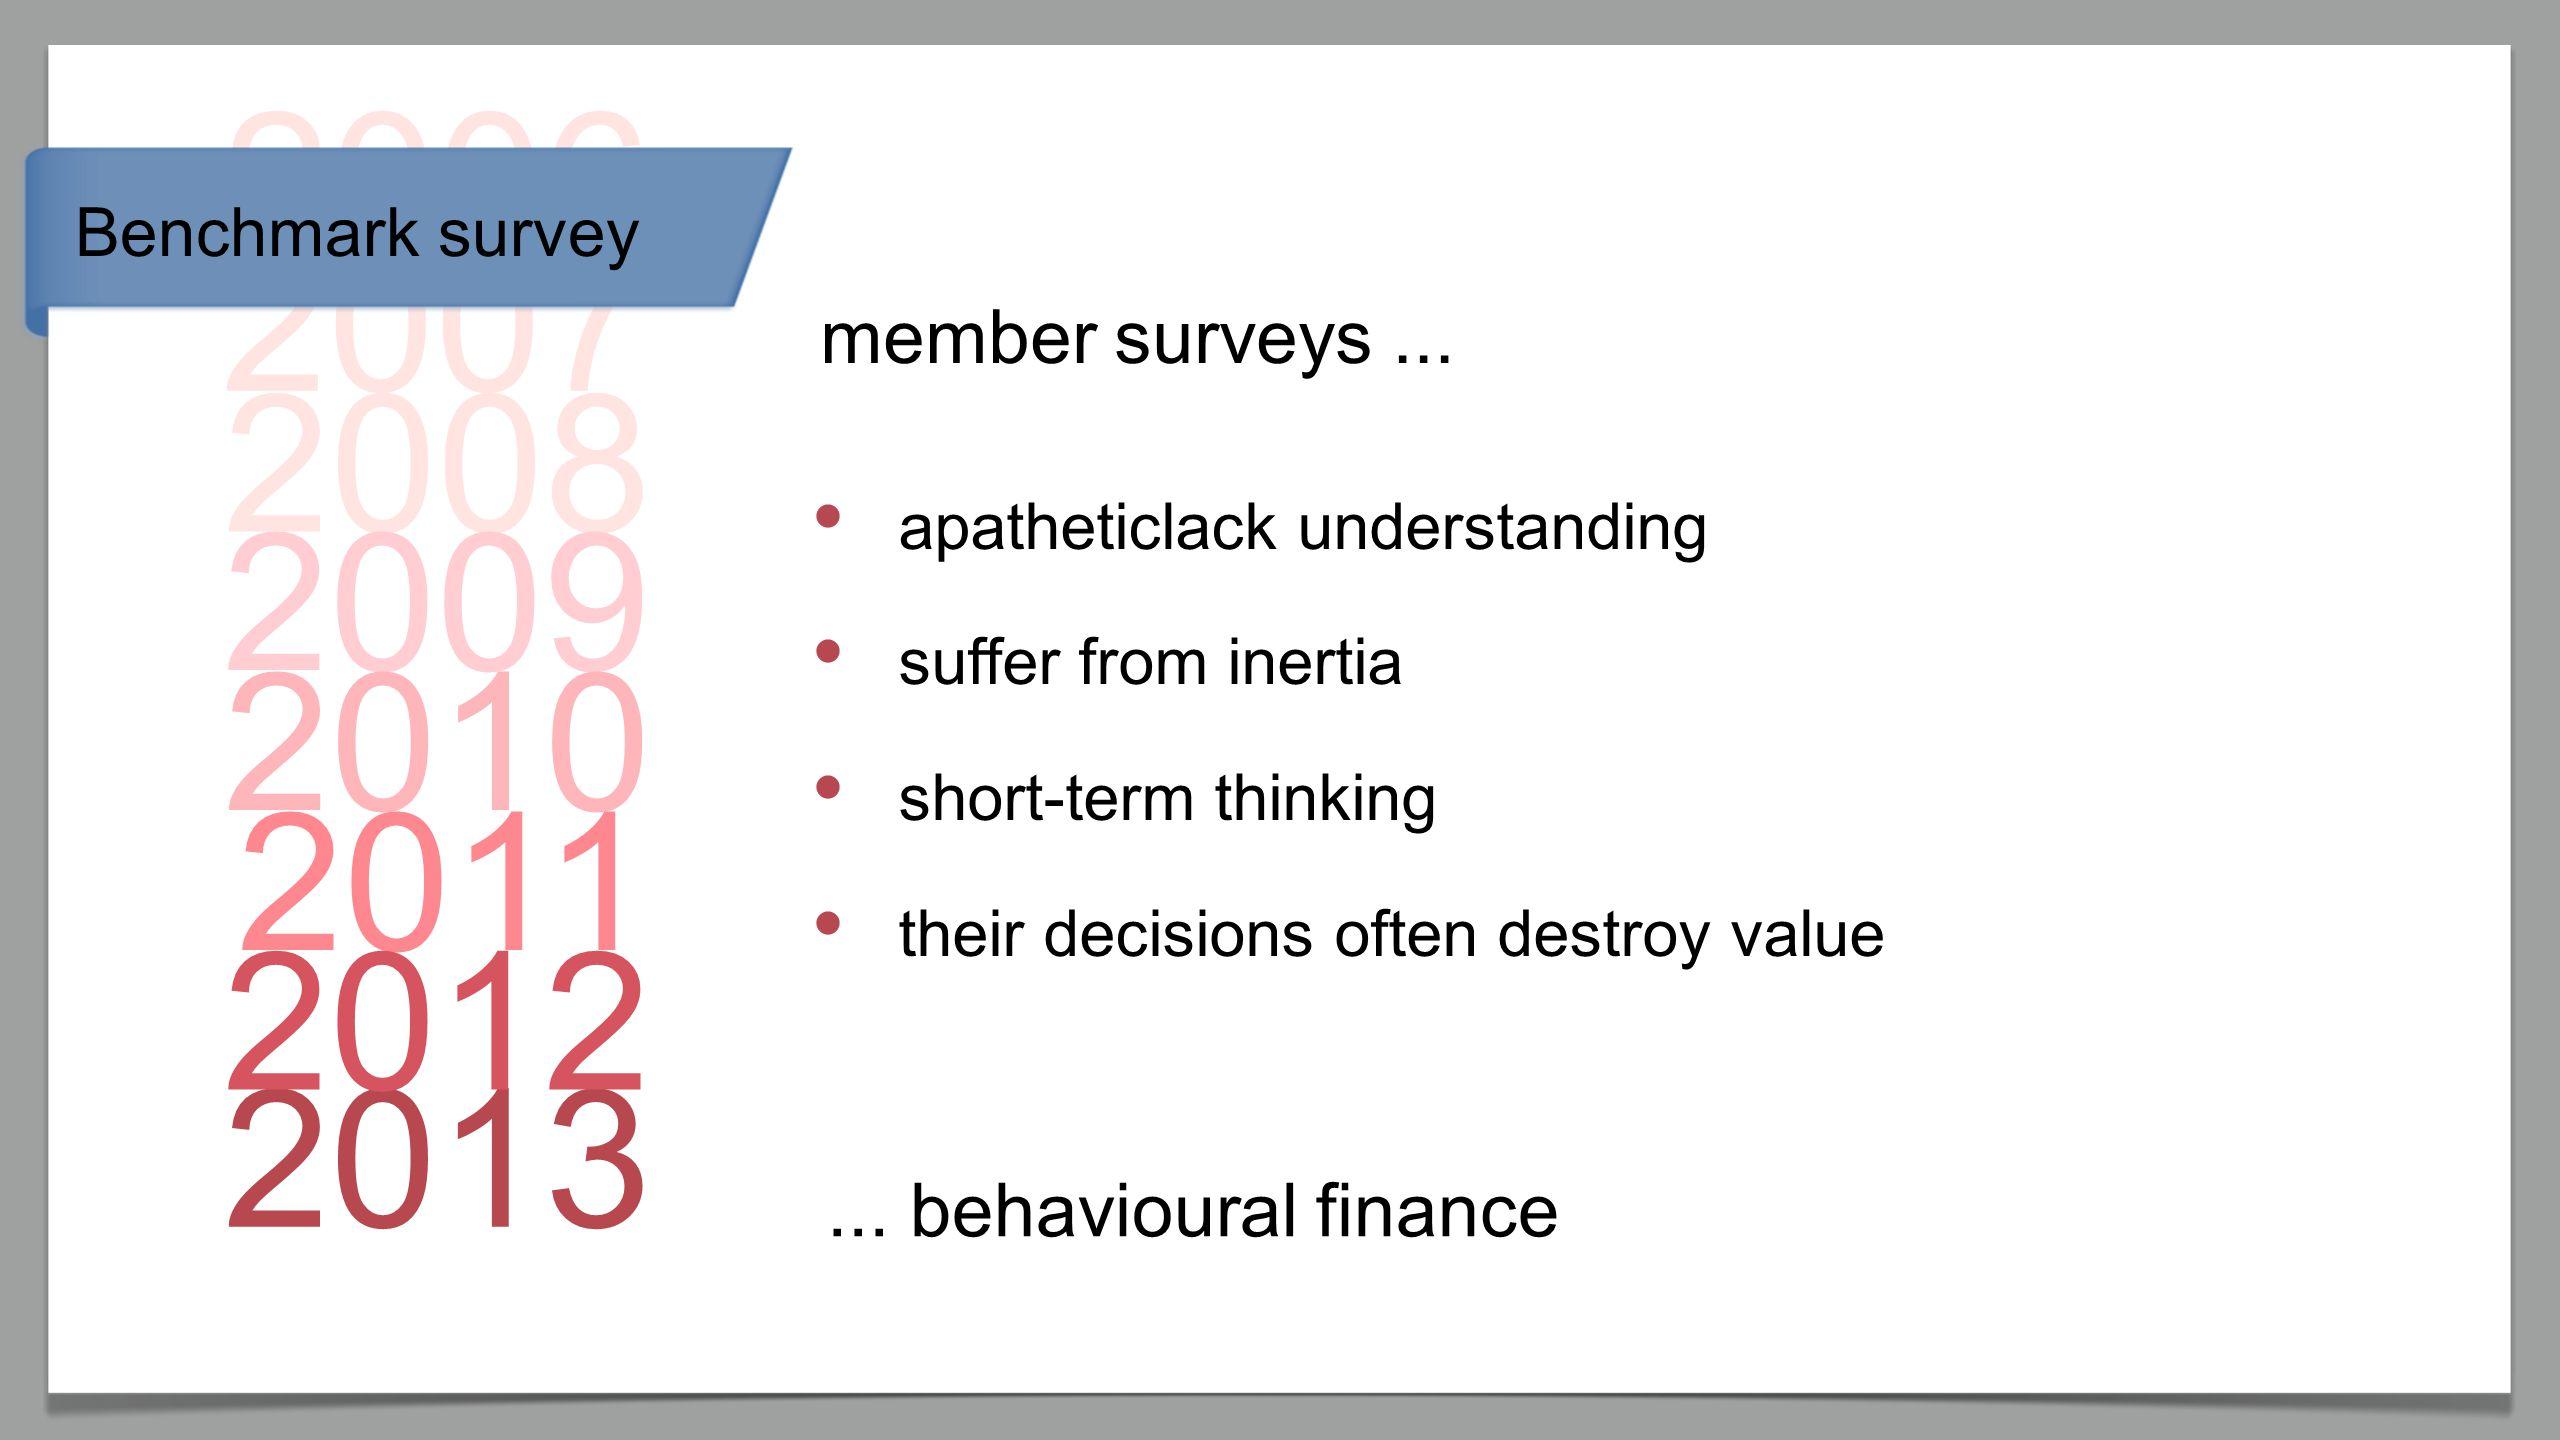 2013 2008 2009 2010 2011 2012 2007 2006 Benchmark survey member surveys...